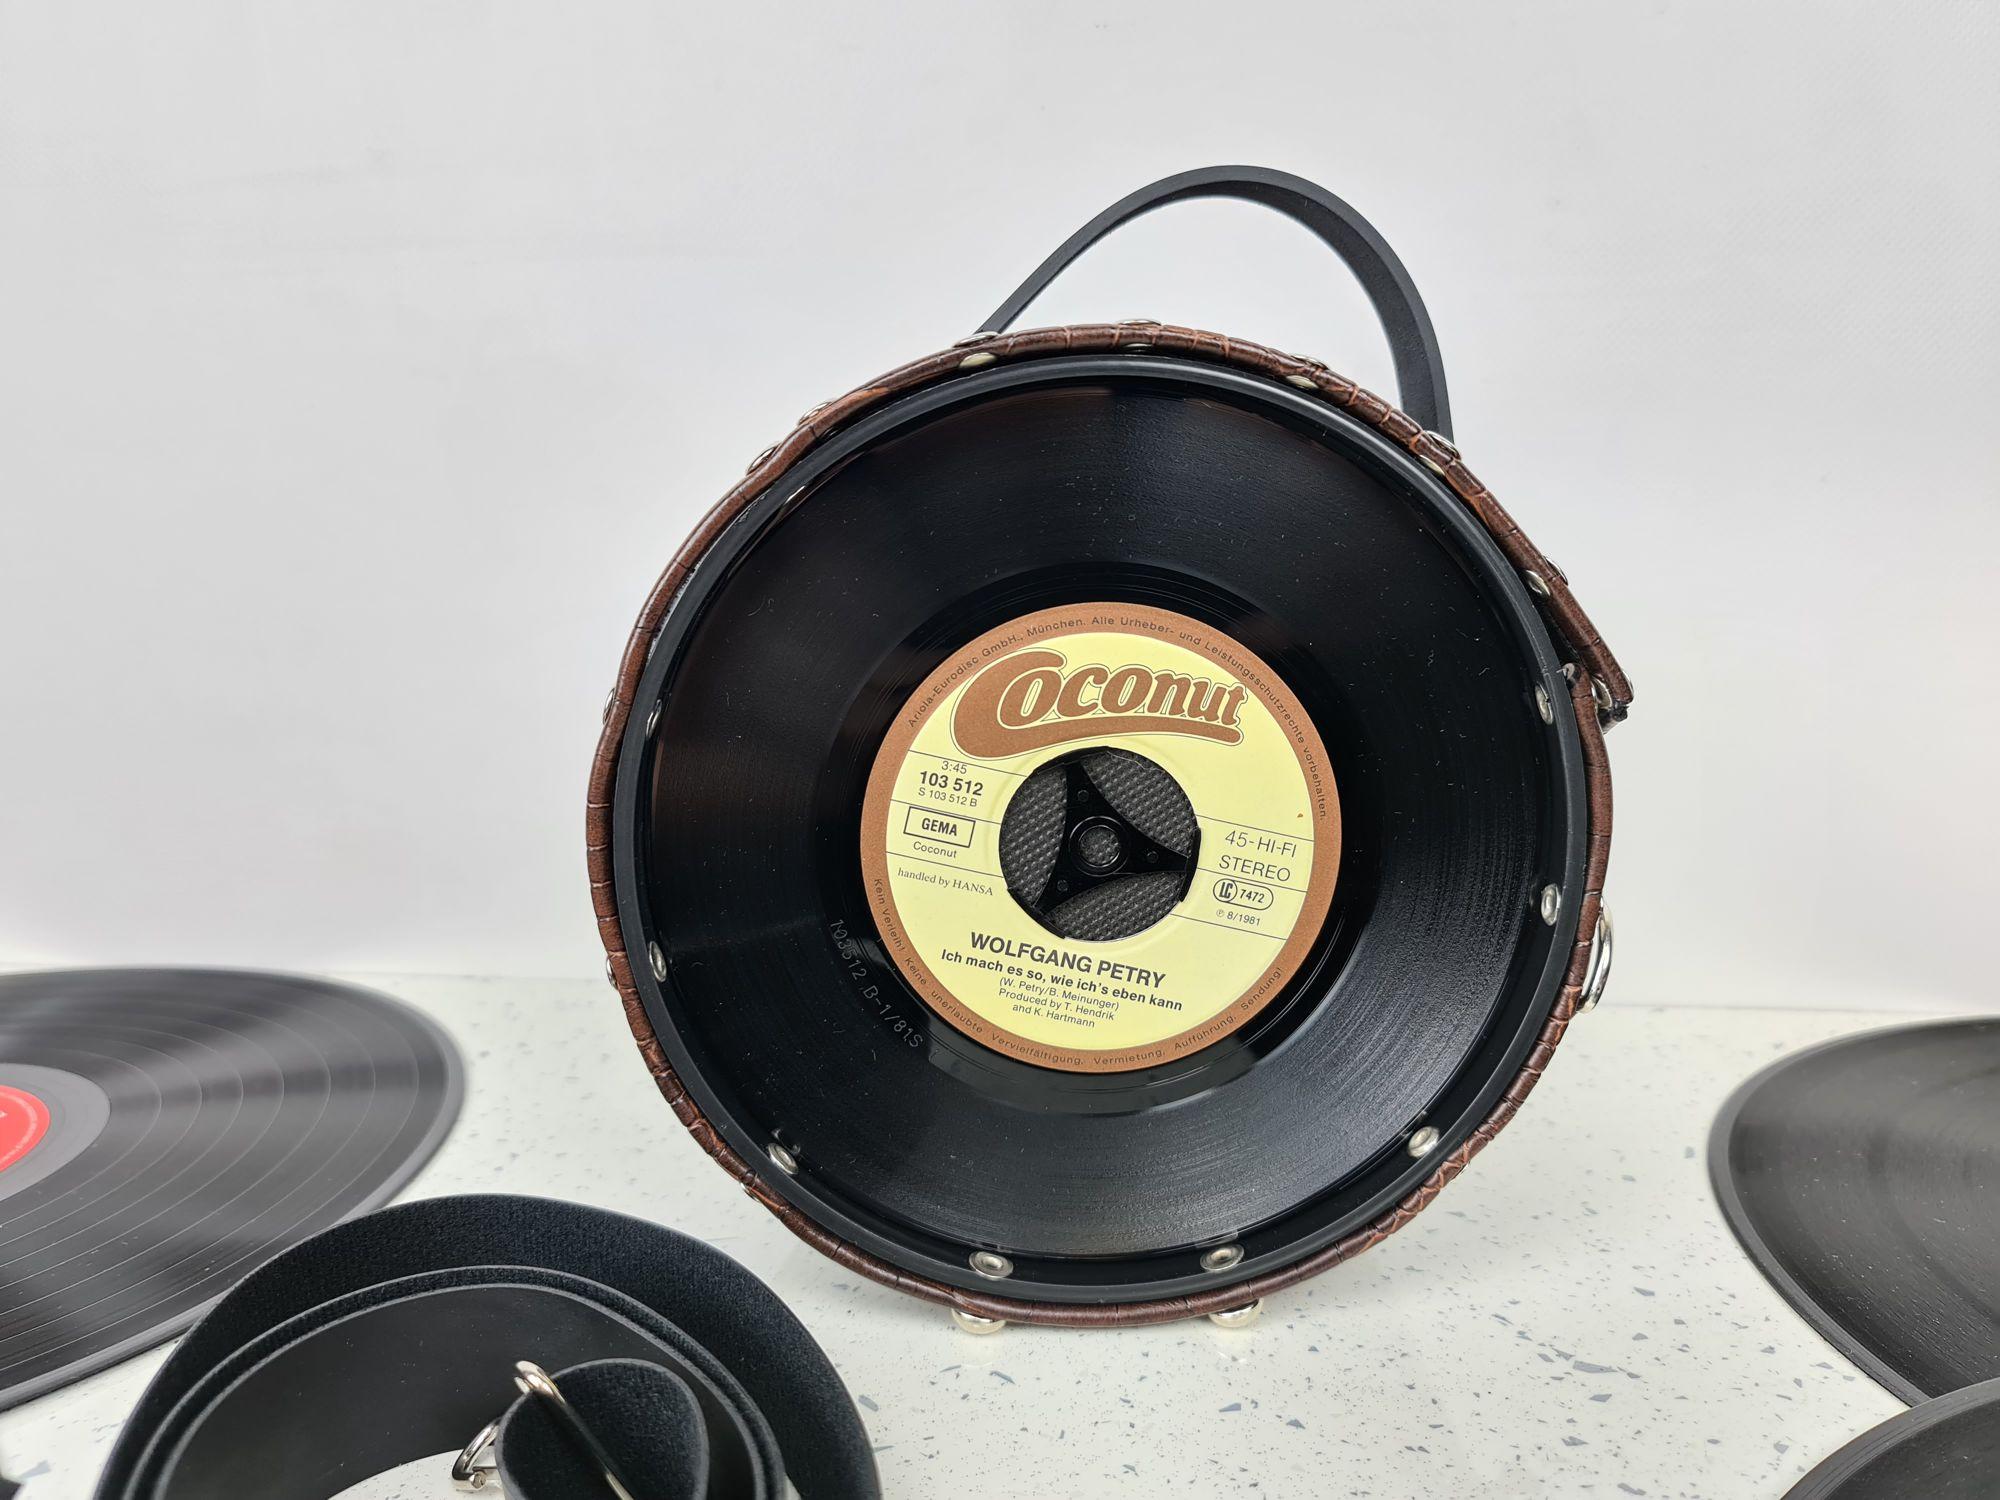 BA001bb_sac-a-main-pin-up-rockabilly-retro-vinyl-45t